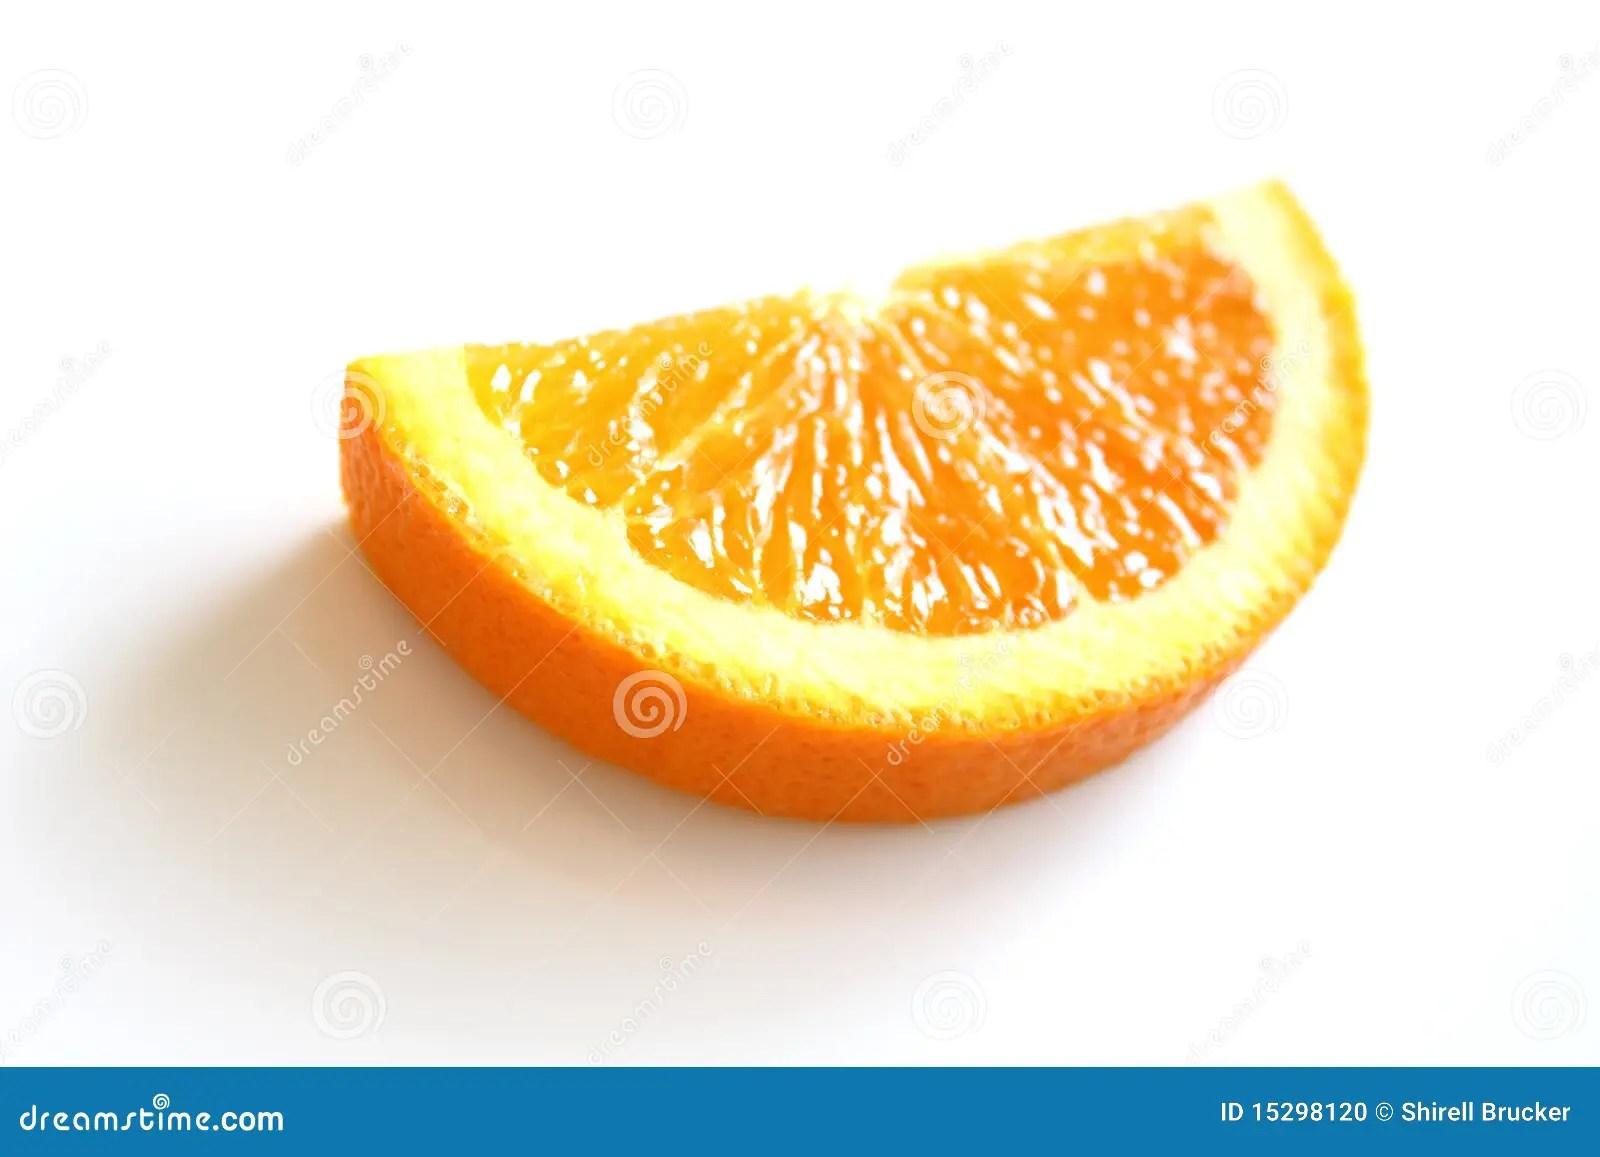 Half Slice Of An Orange Stock Photo